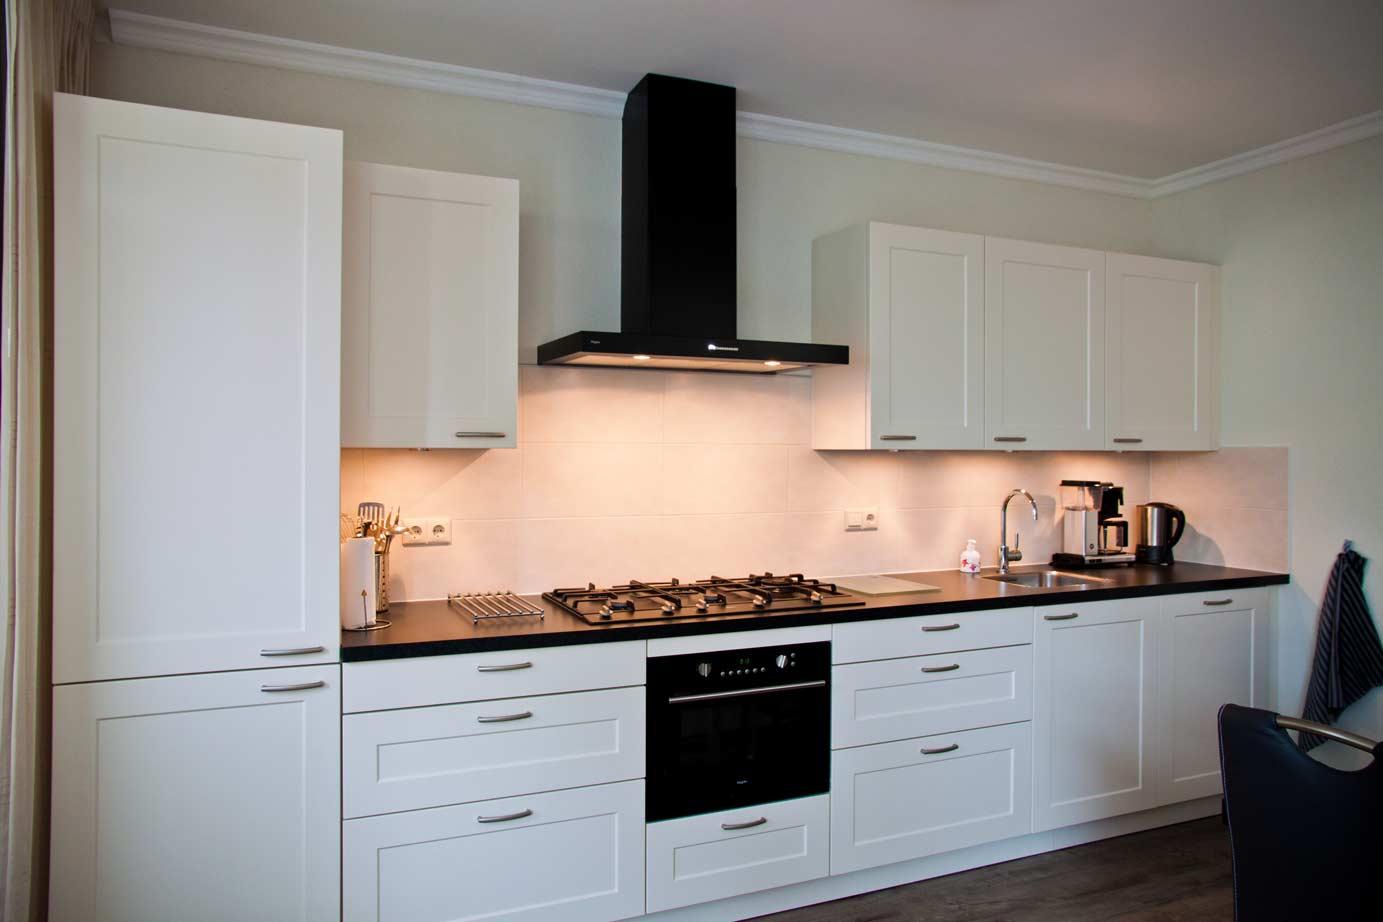 Keukentips Keuken kopen? De tien beste tips! DB Keukens